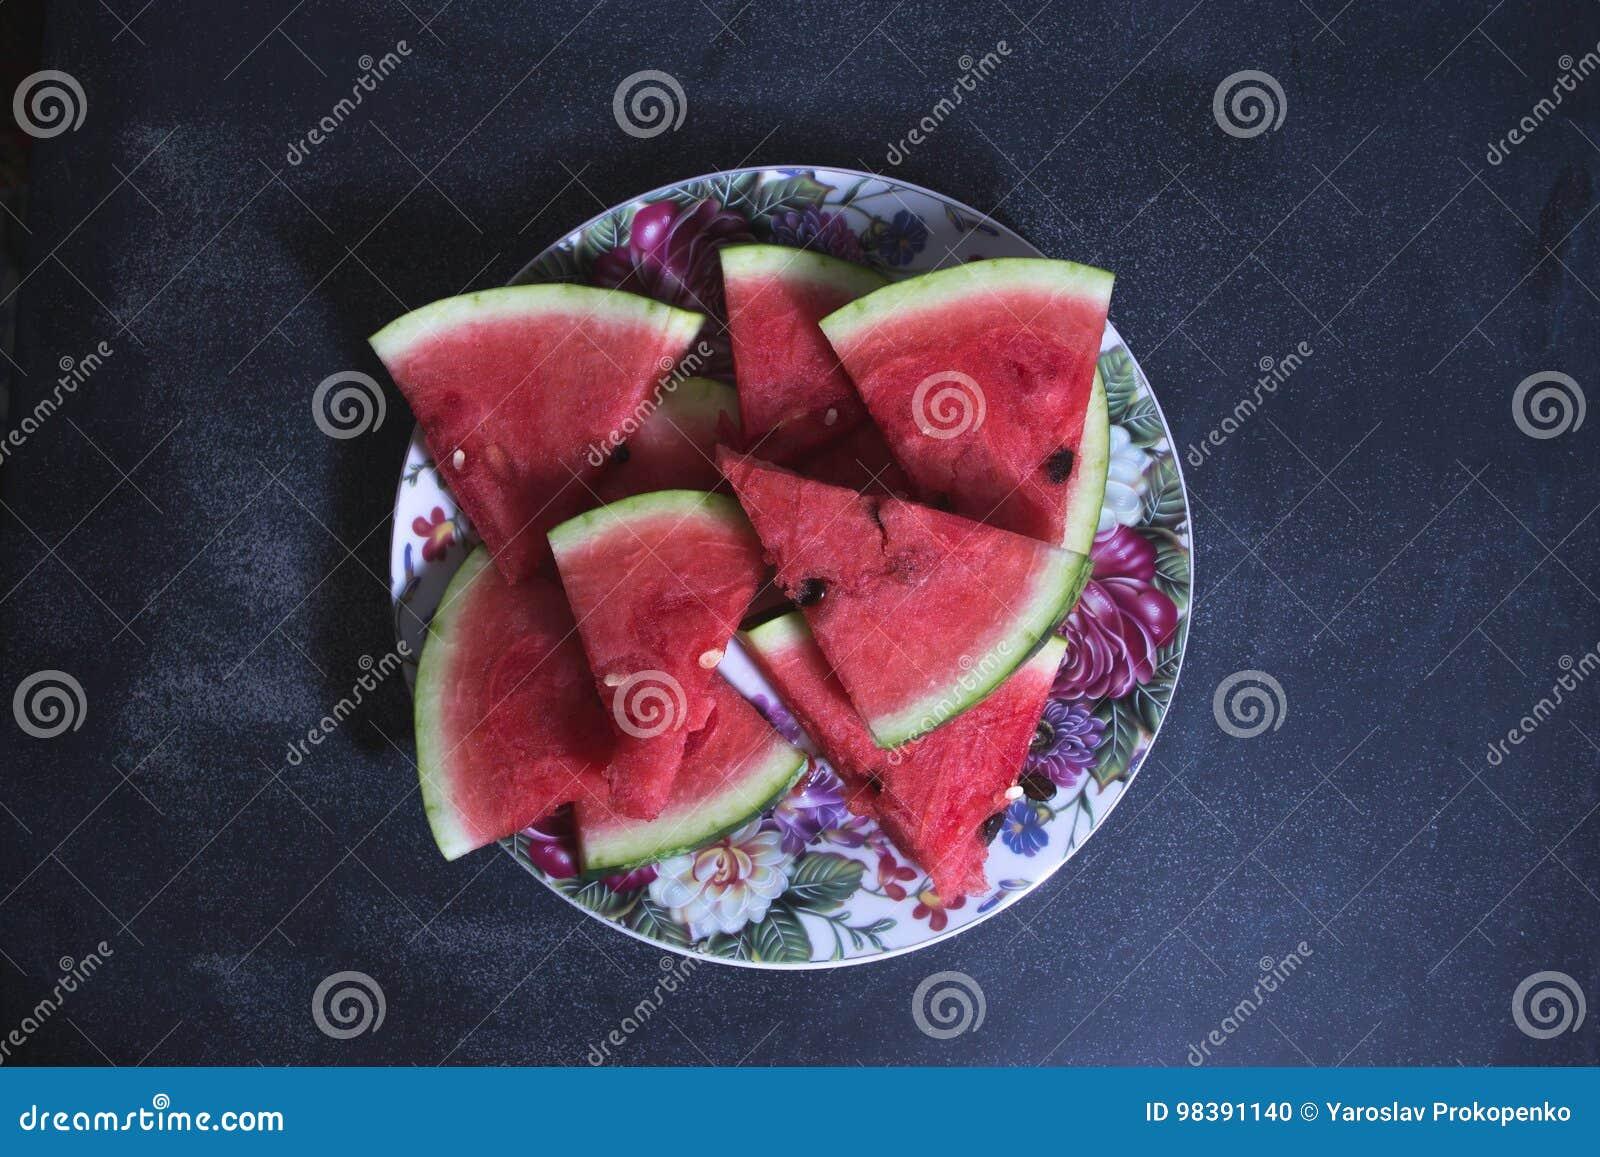 Sliced slices of watermelon on a dark background.